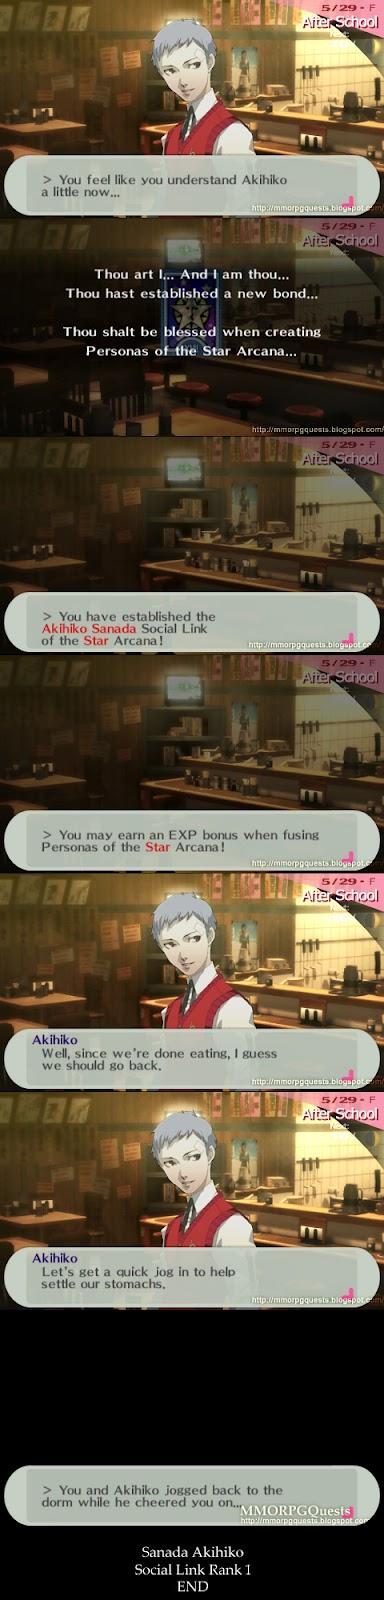 P3p dating akihiko